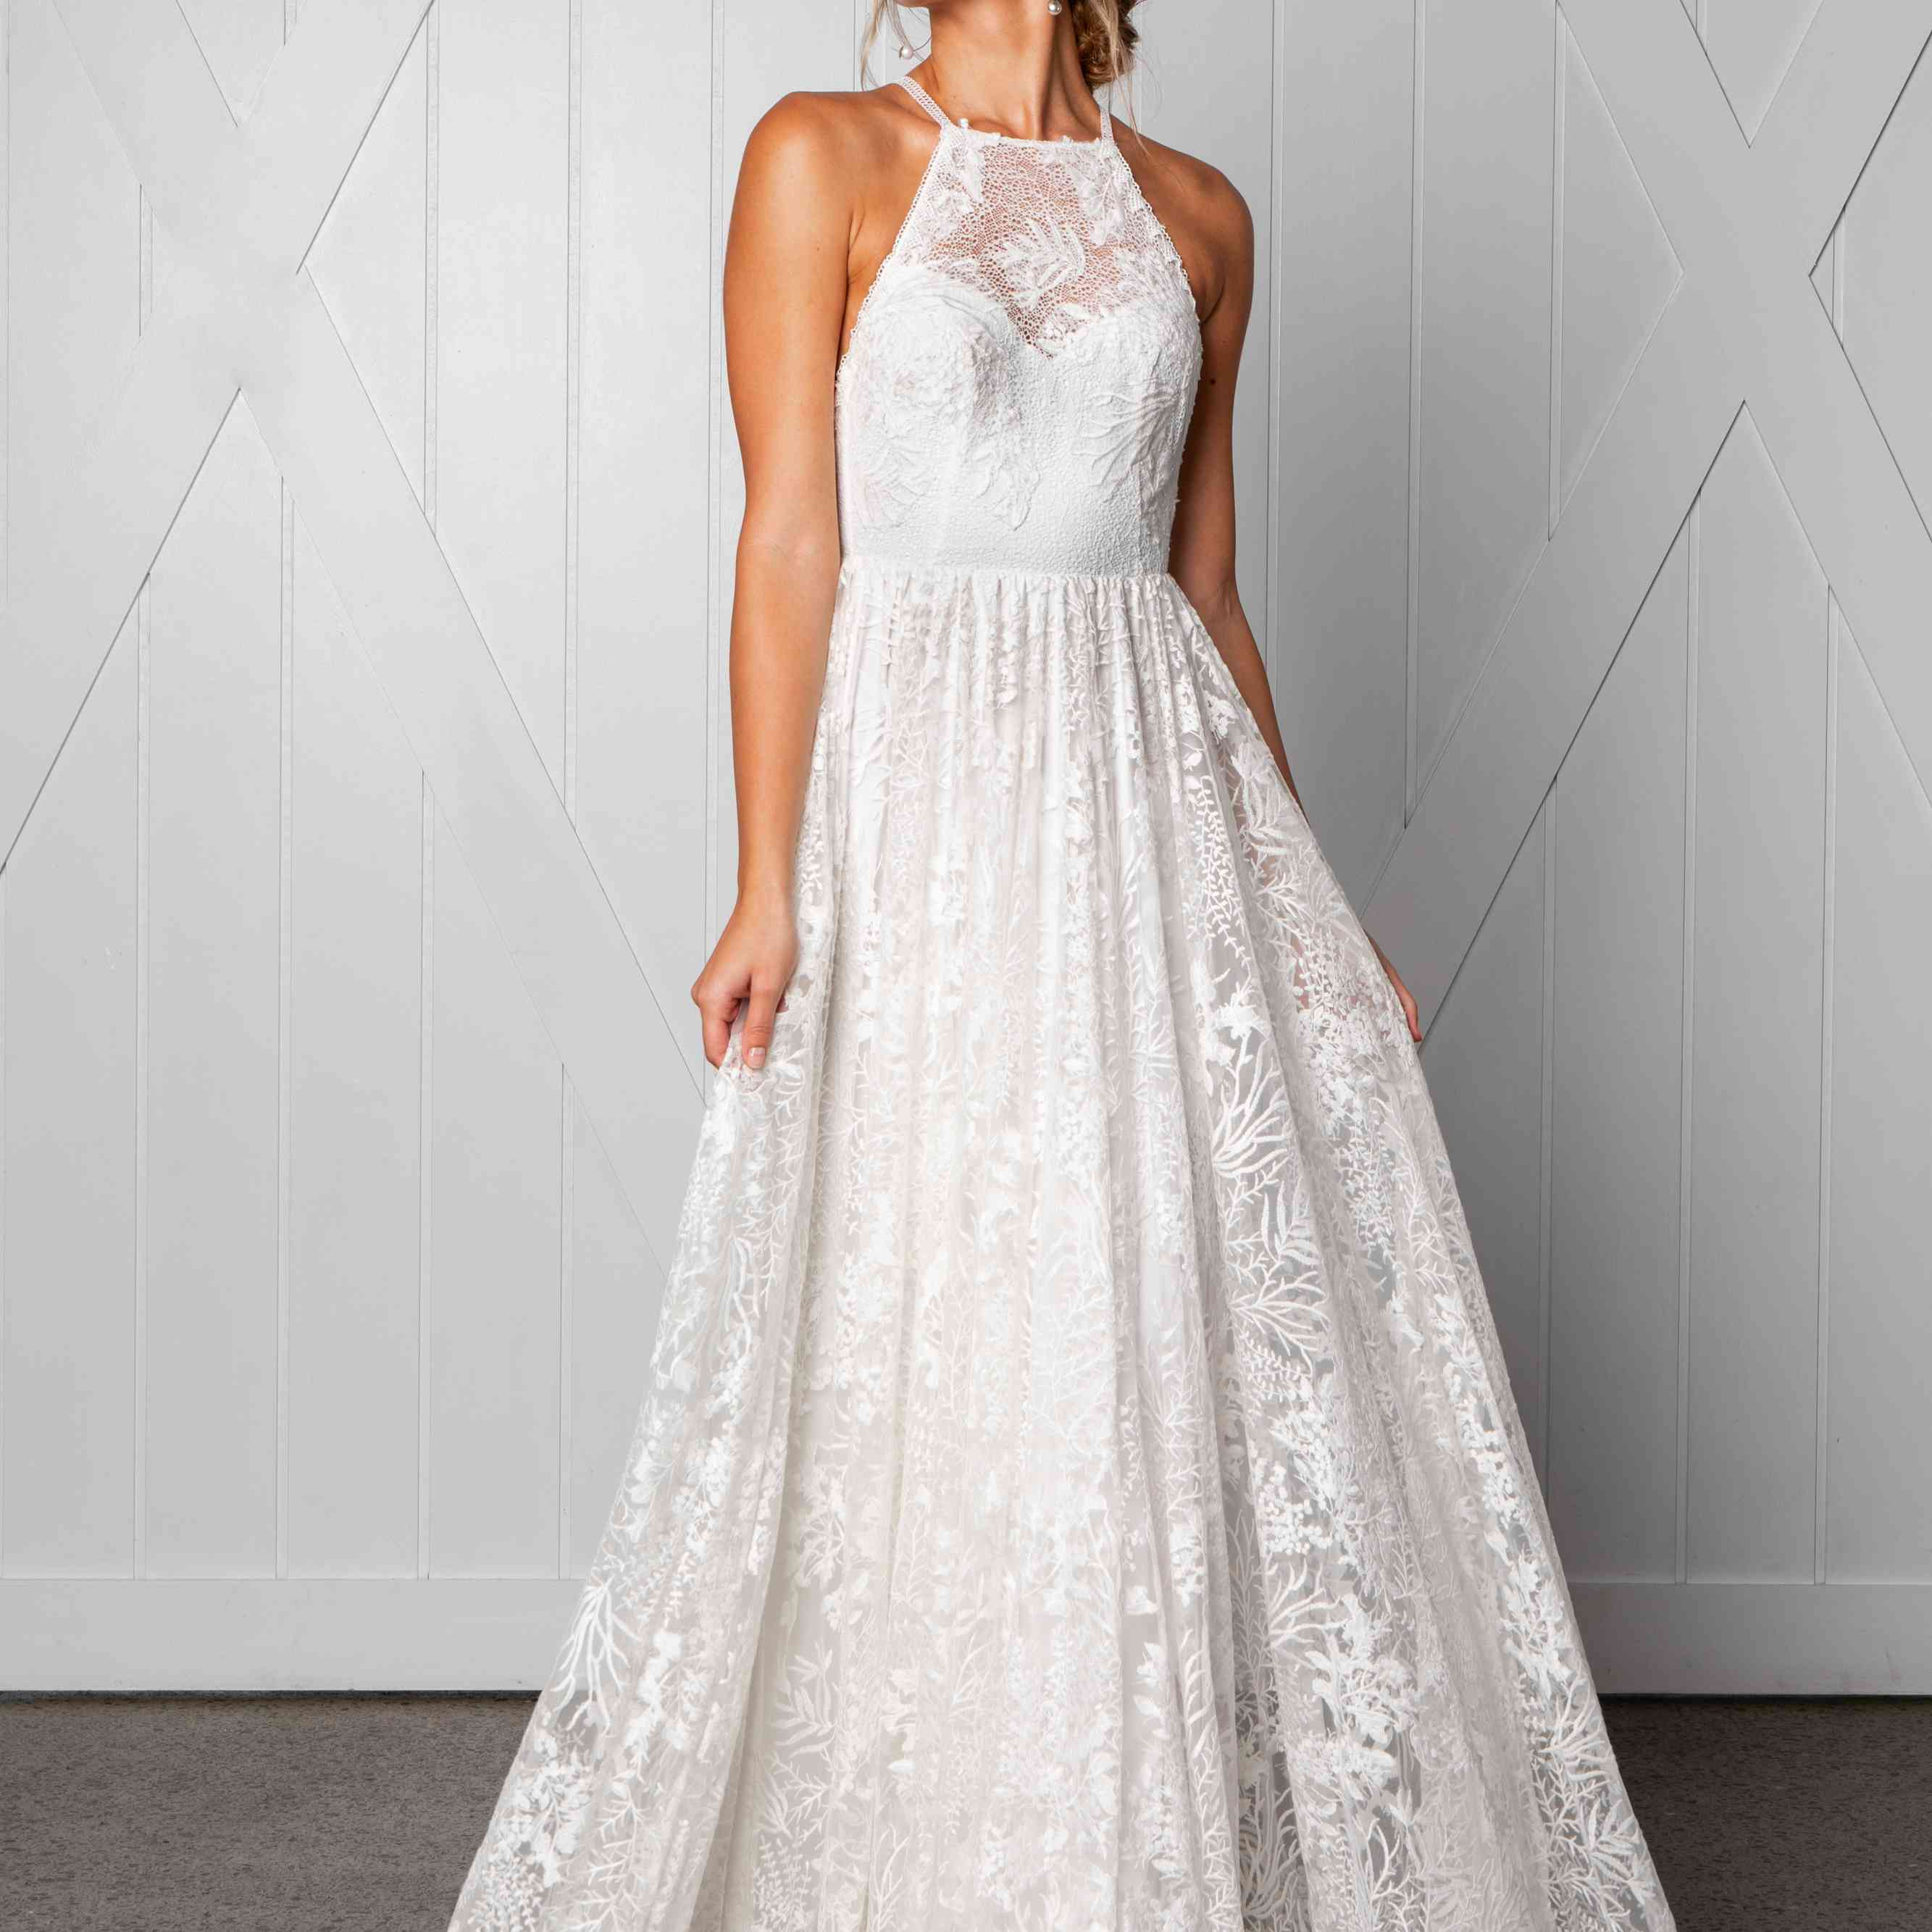 Harri halter wedding dress